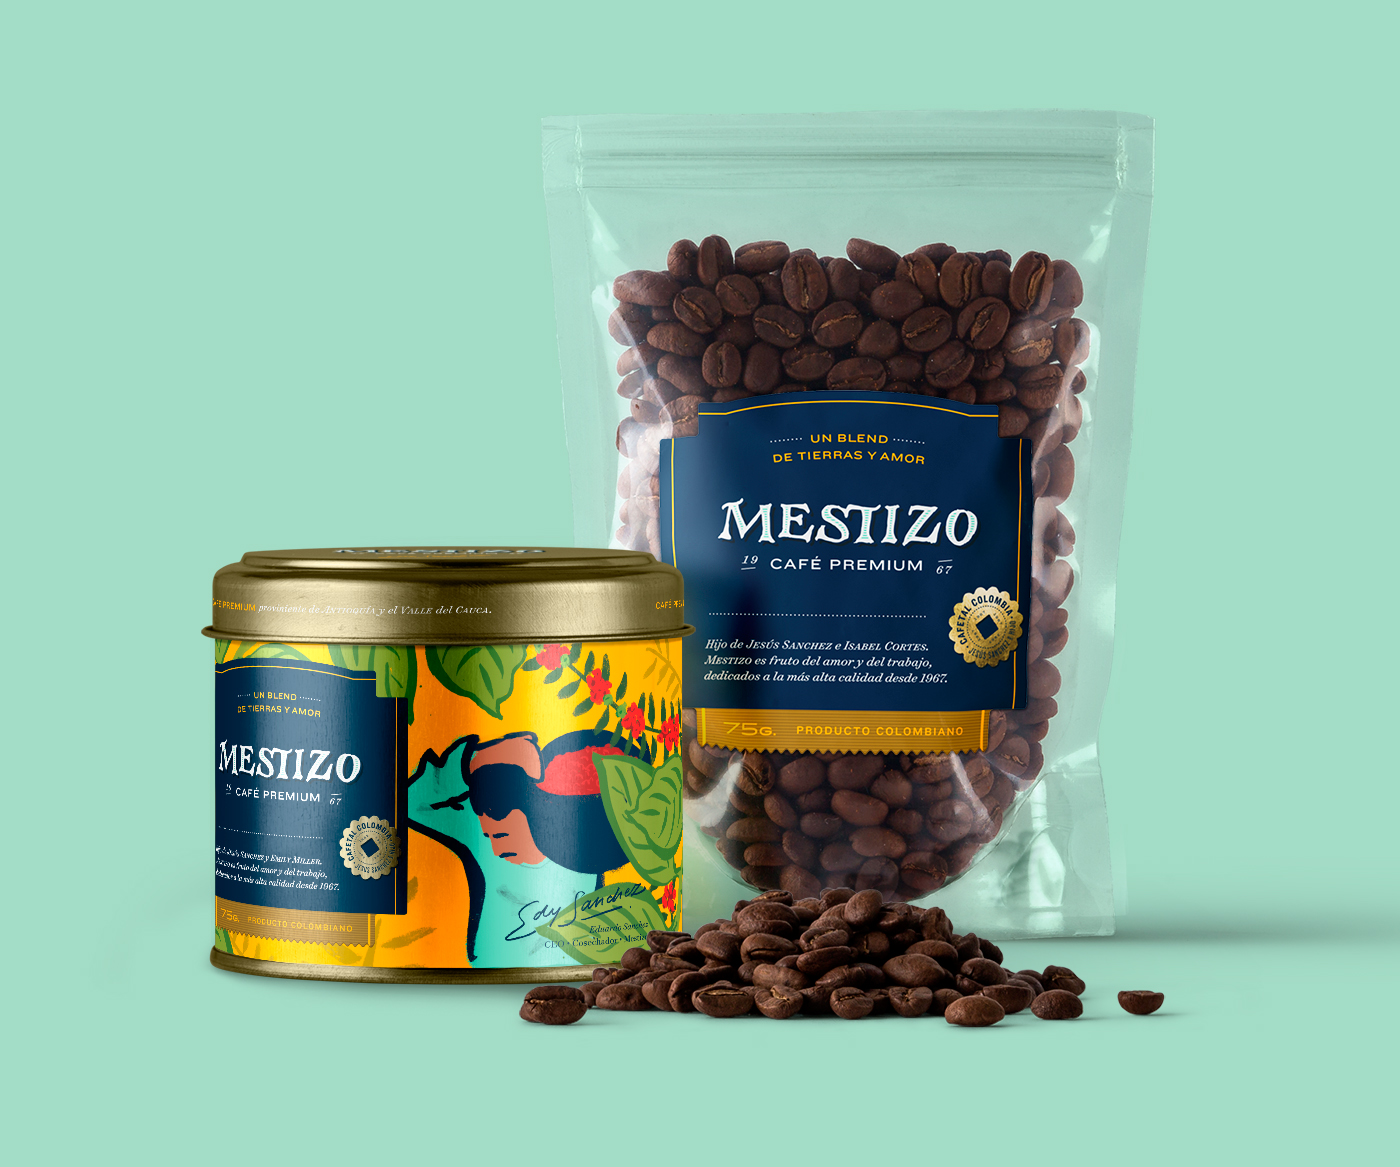 Mestizo packaging